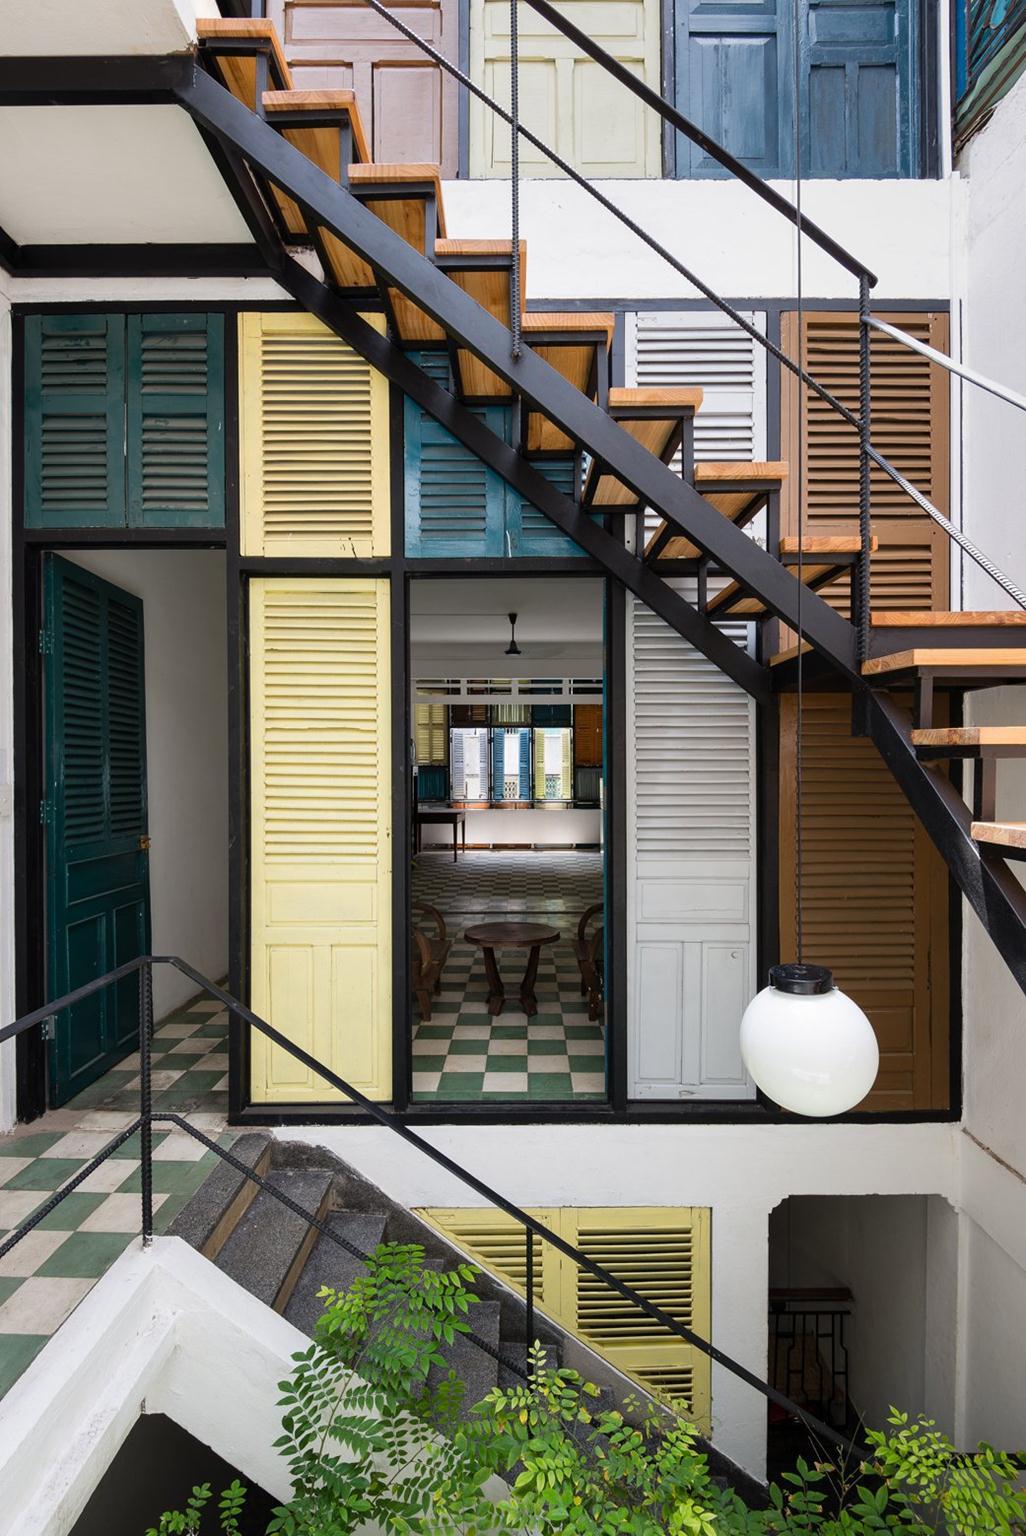 557a5acfe58eced6280001f6_vegan-house-block-architects_11 (Copy)